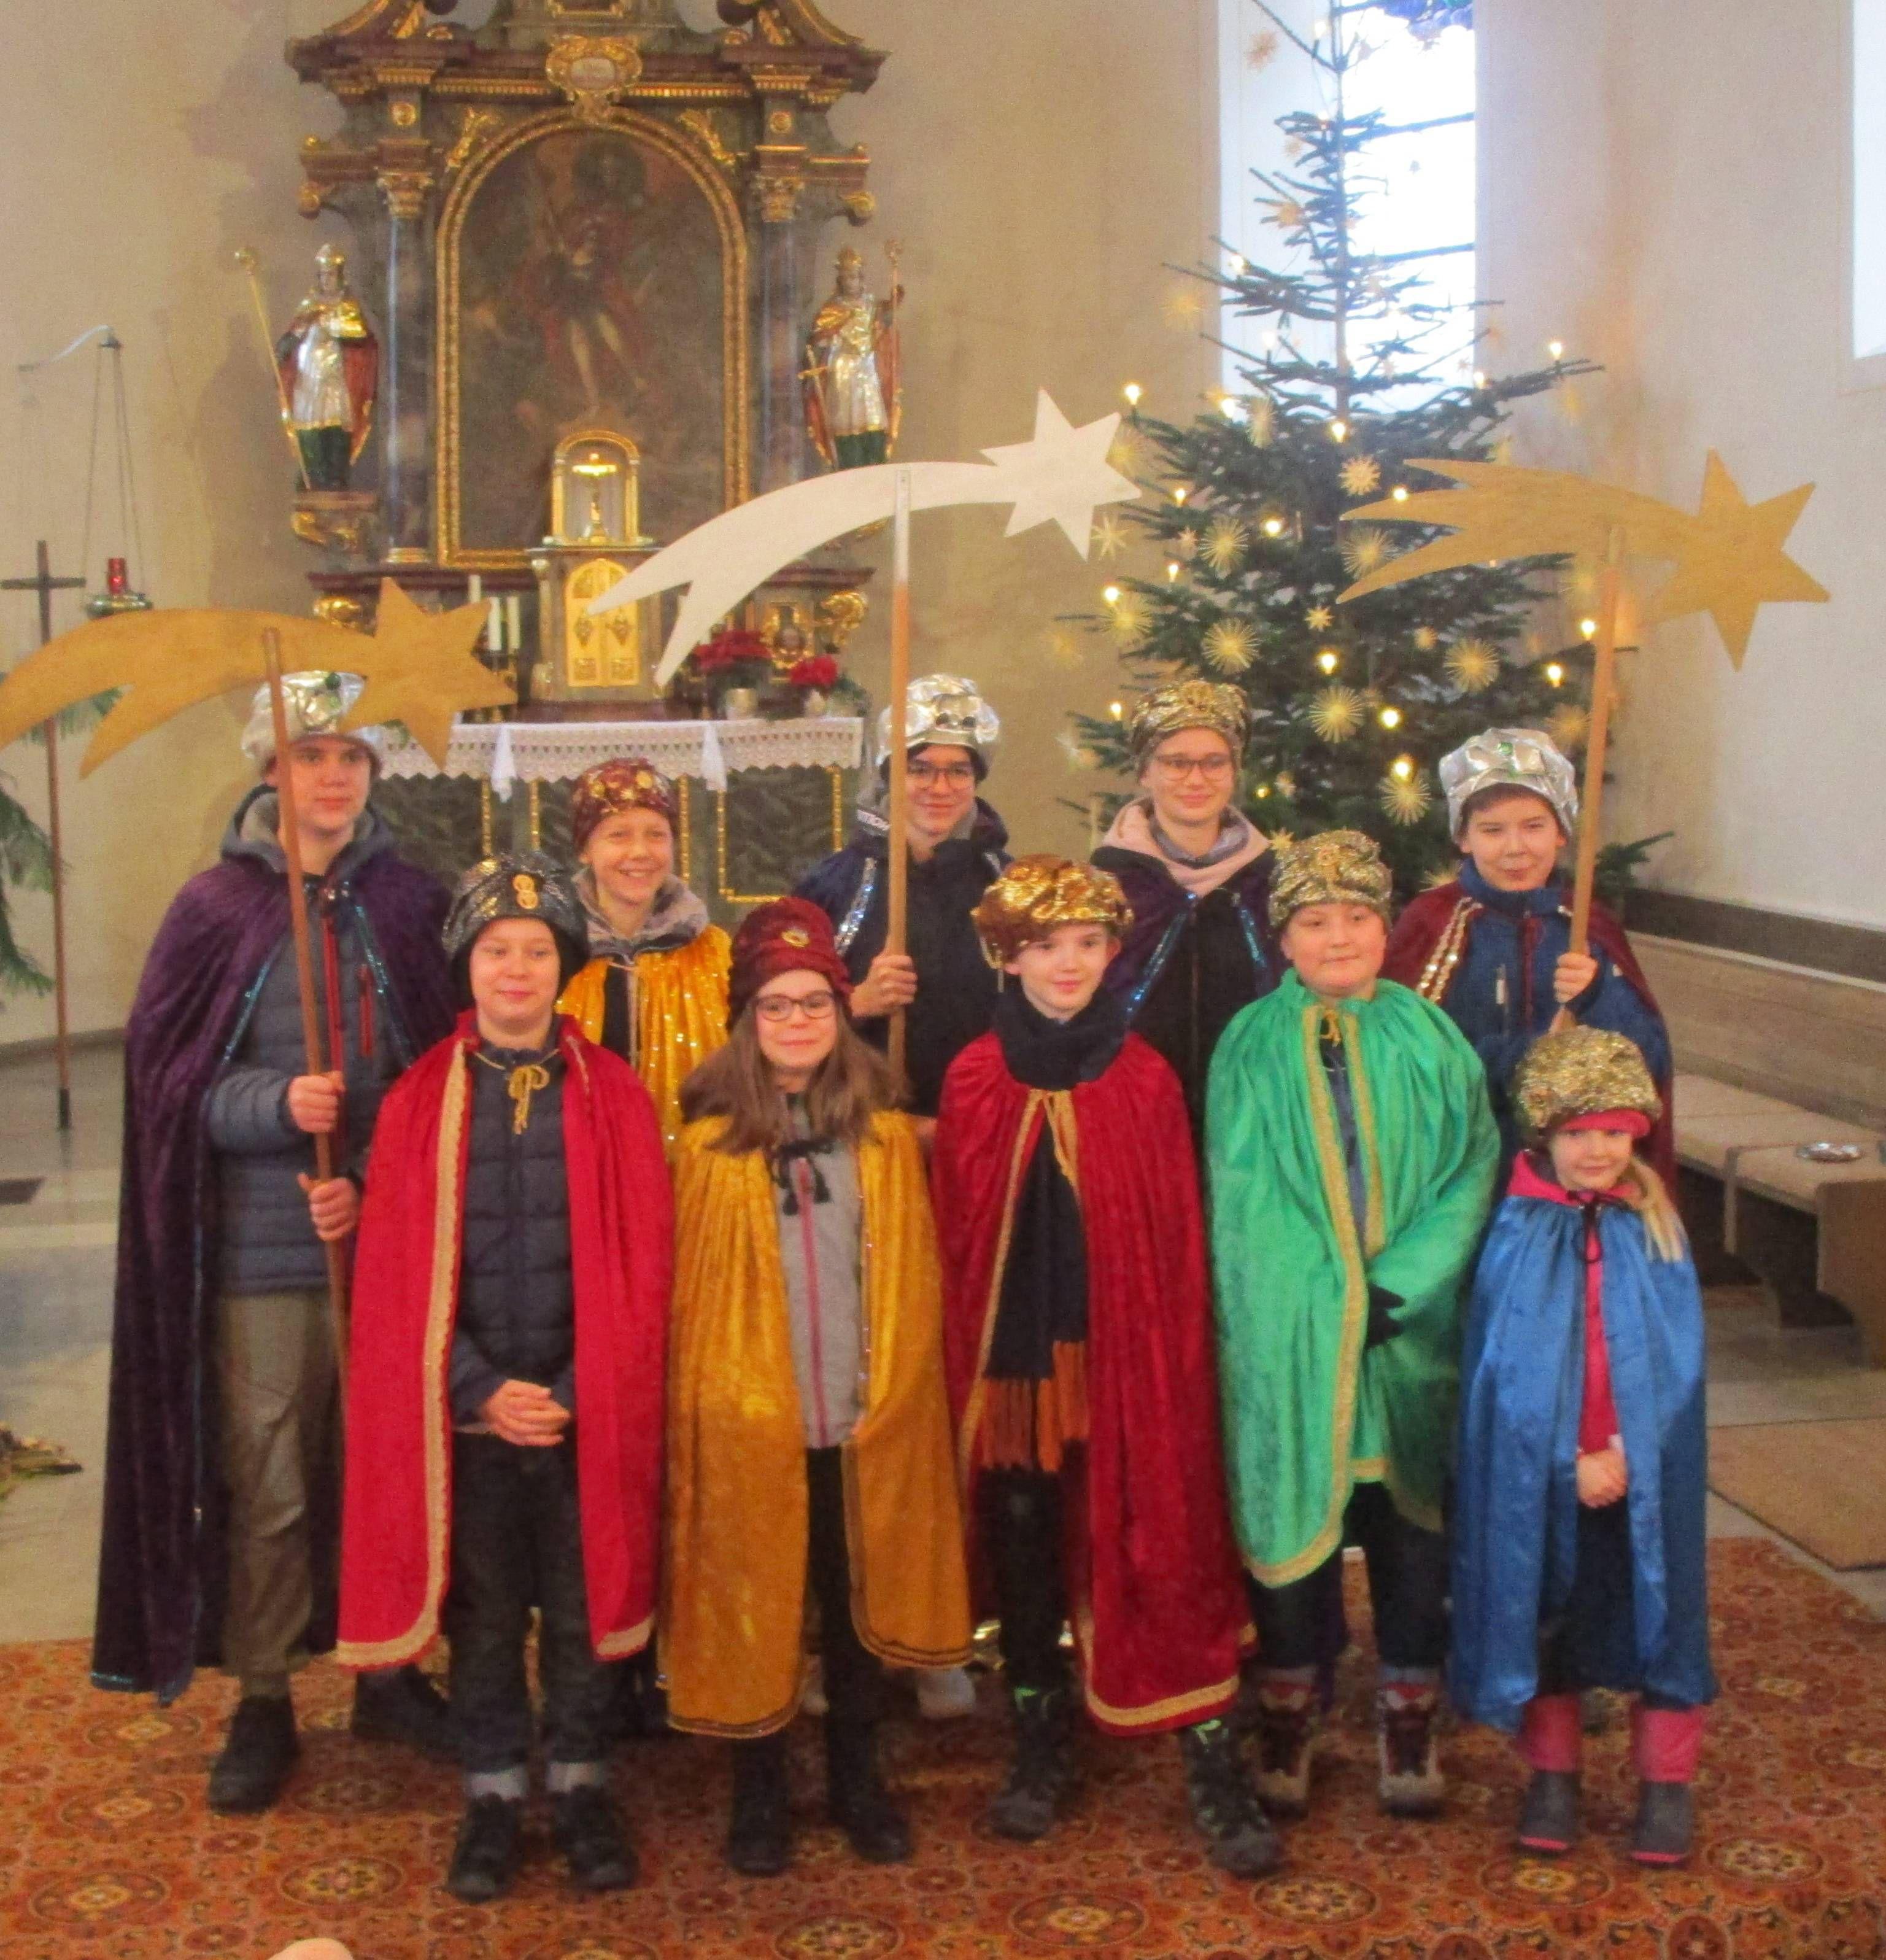 Die Sternsinger der Pfarrei St. Kilian in Blankenbach (Dekanat Alzenau).